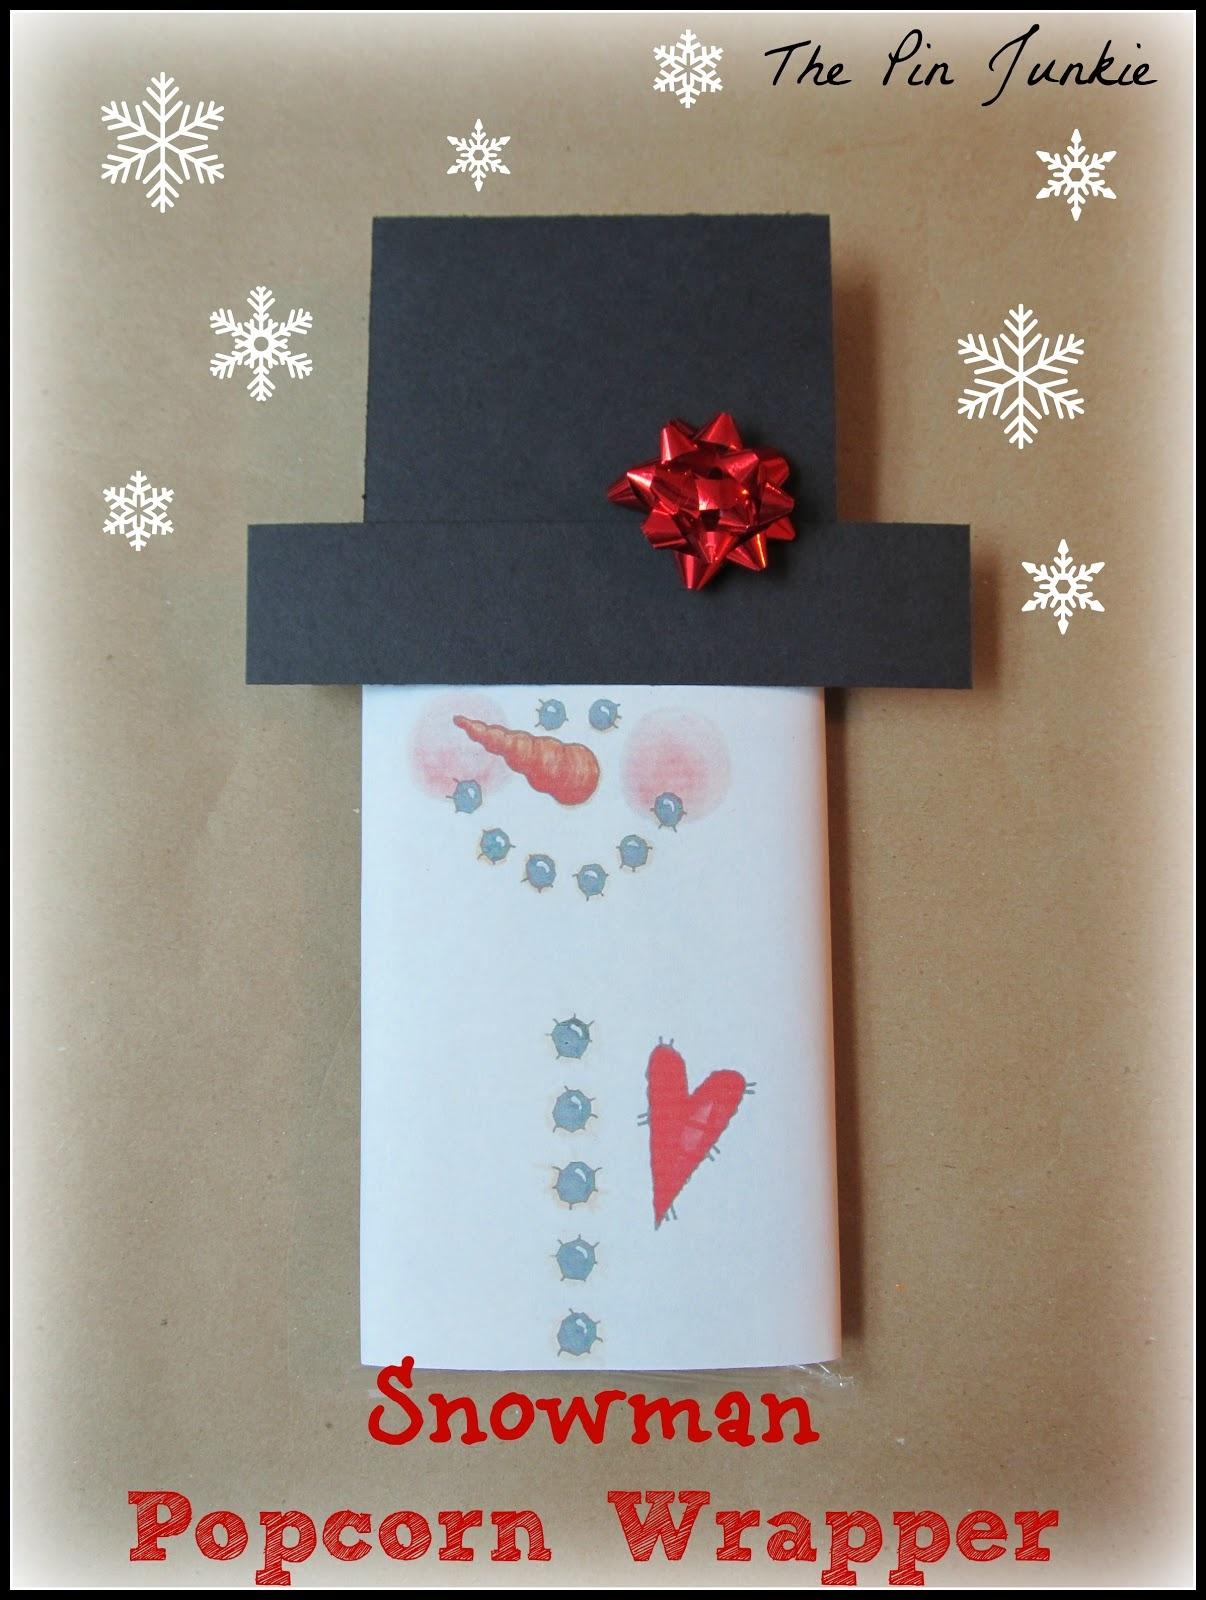 Snowman Printable Popcorn Wrapper - Snowman Candy Bar Wrapper Free Printable